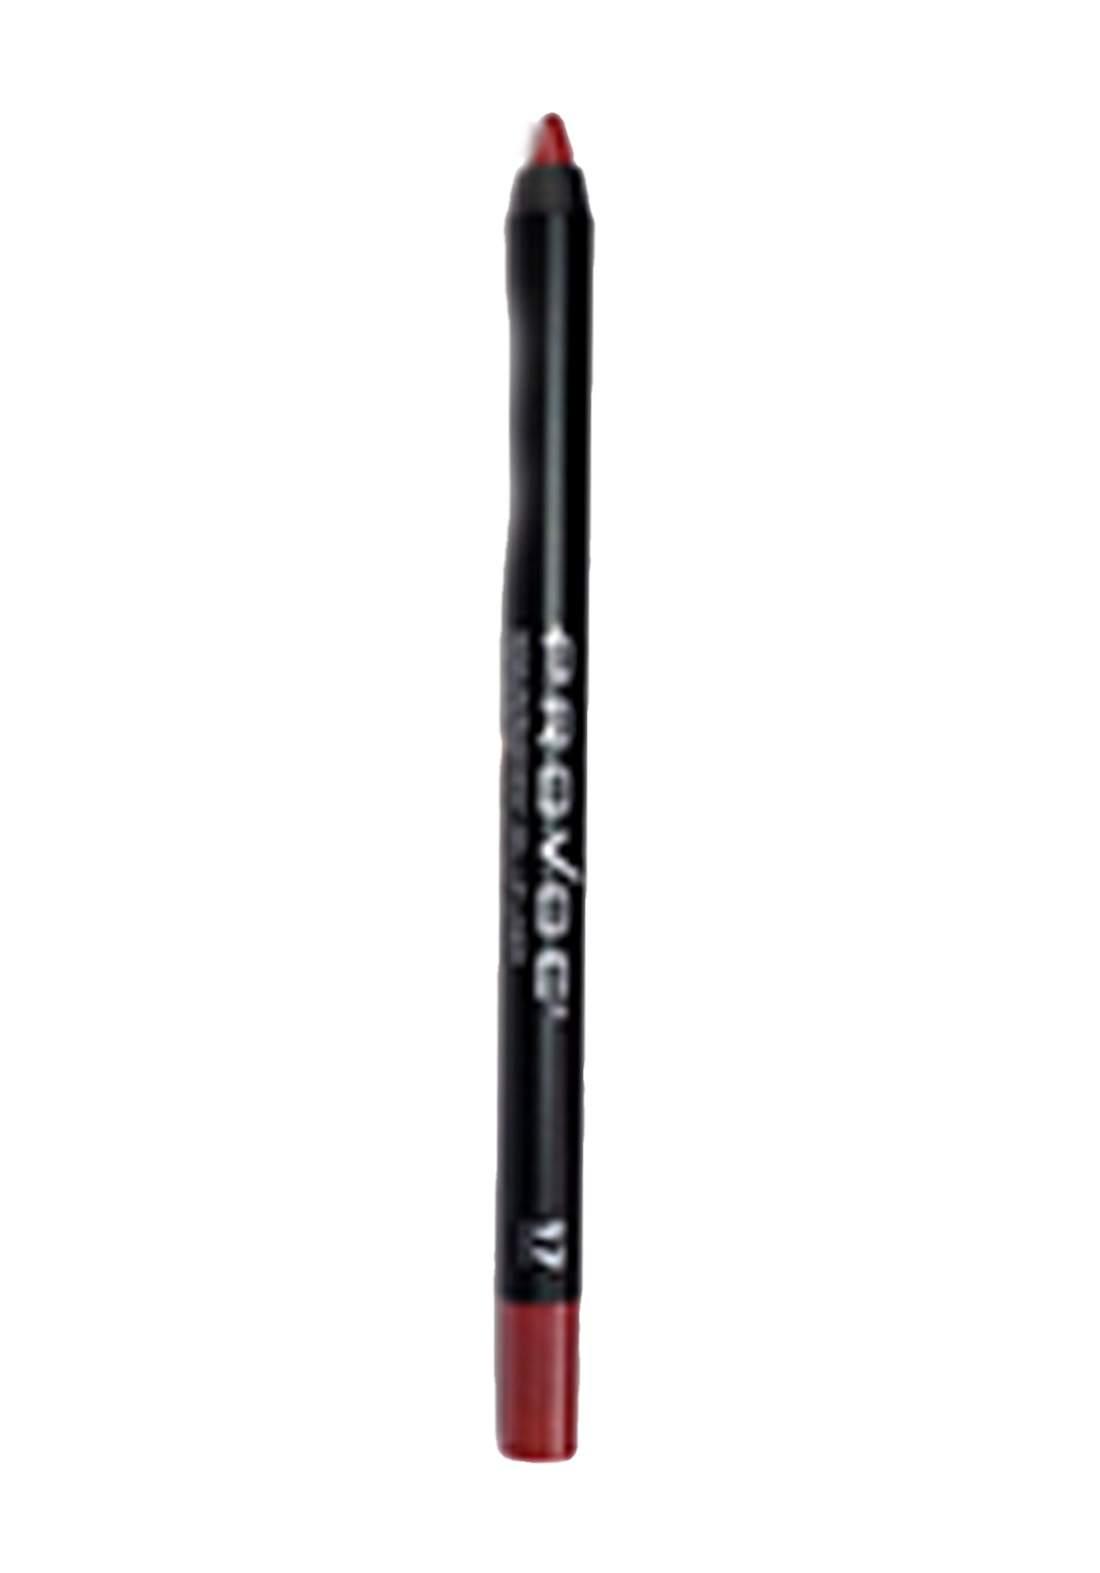 Provoc 353-0067 Semi-Permanent Waterproof Gel Lip Liner Pencil No.17 Vintage Rose محدد الشفاه